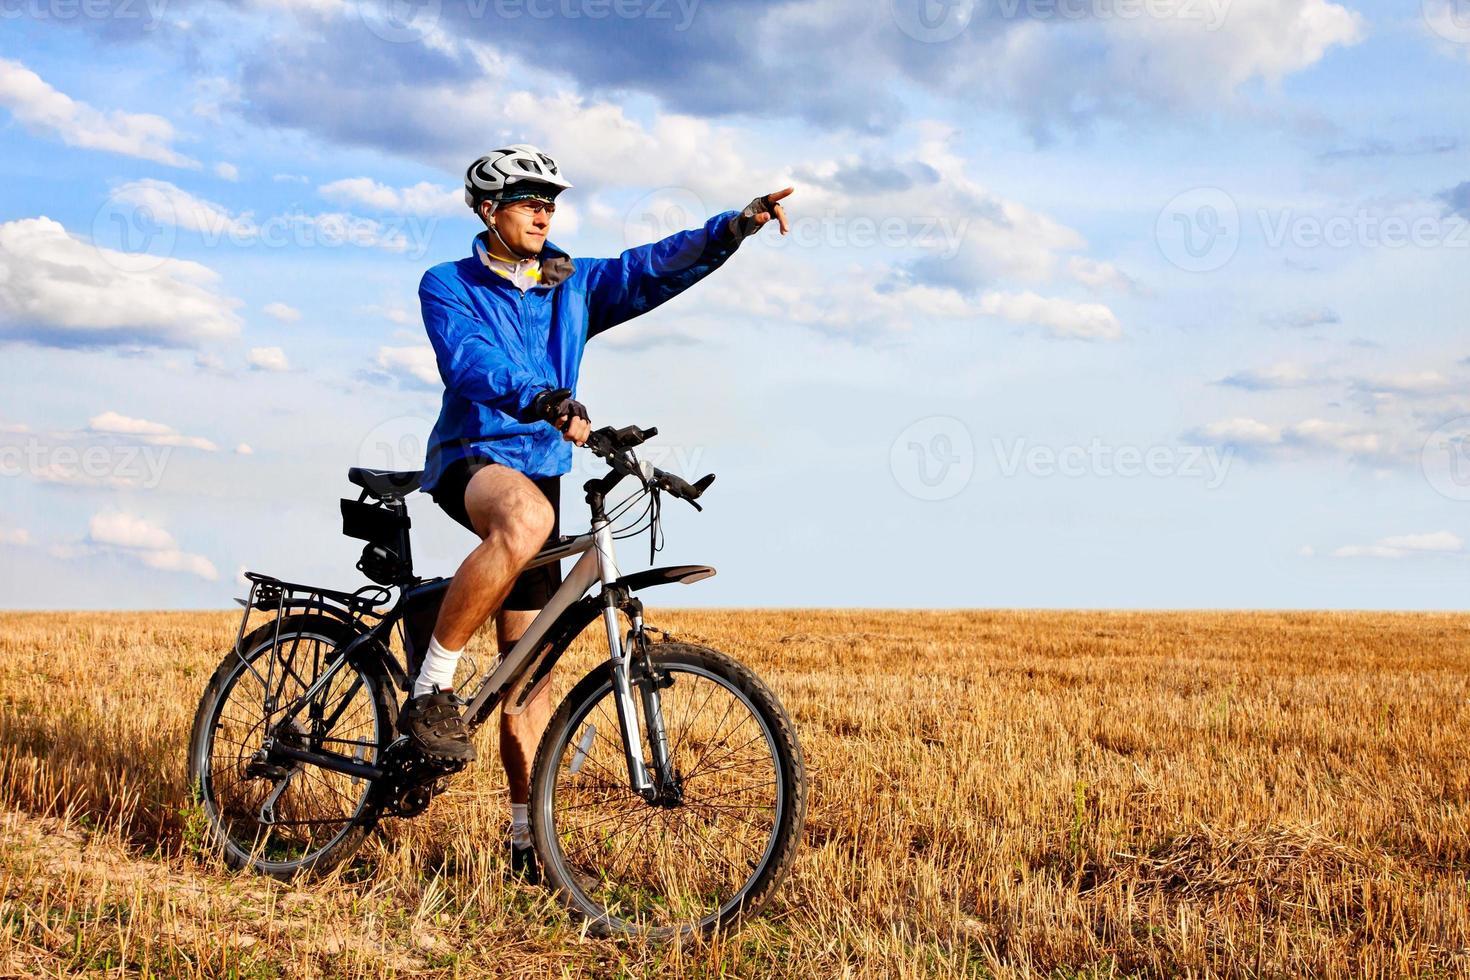 Mountainbiker auf dem Feld foto